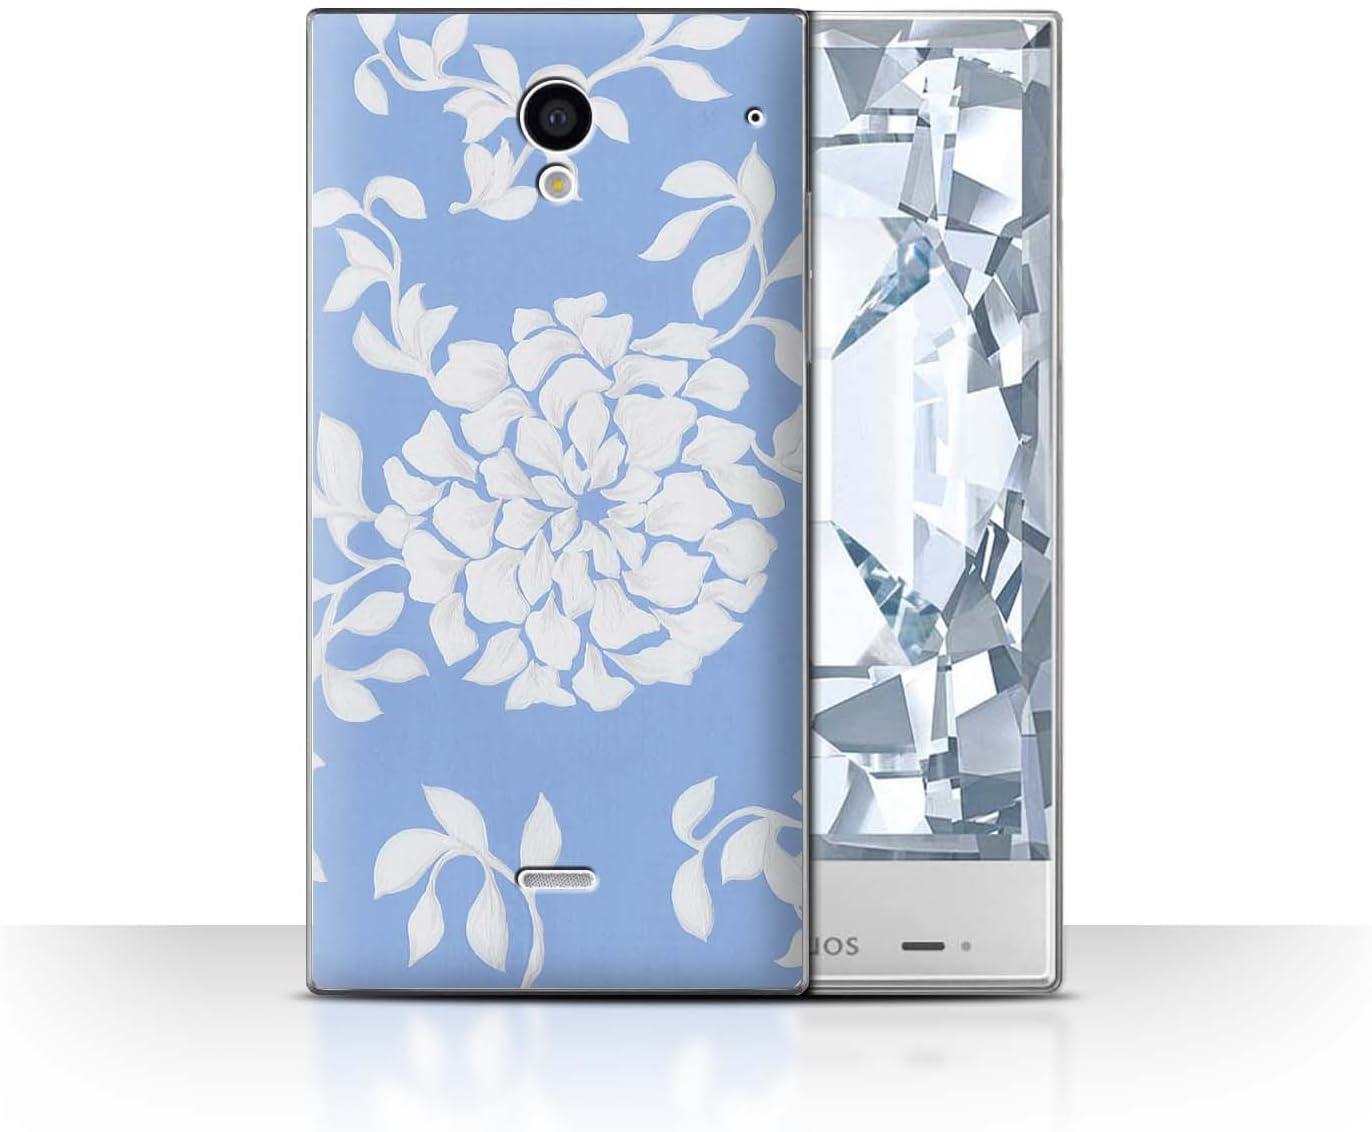 Stuff4® Phone Case/Cover/Skin/SP-CC/bluefshn Collection Fiore Chiaro Sharp Aquos Zeta SH-01F/Docomo: Amazon.es: Electrónica